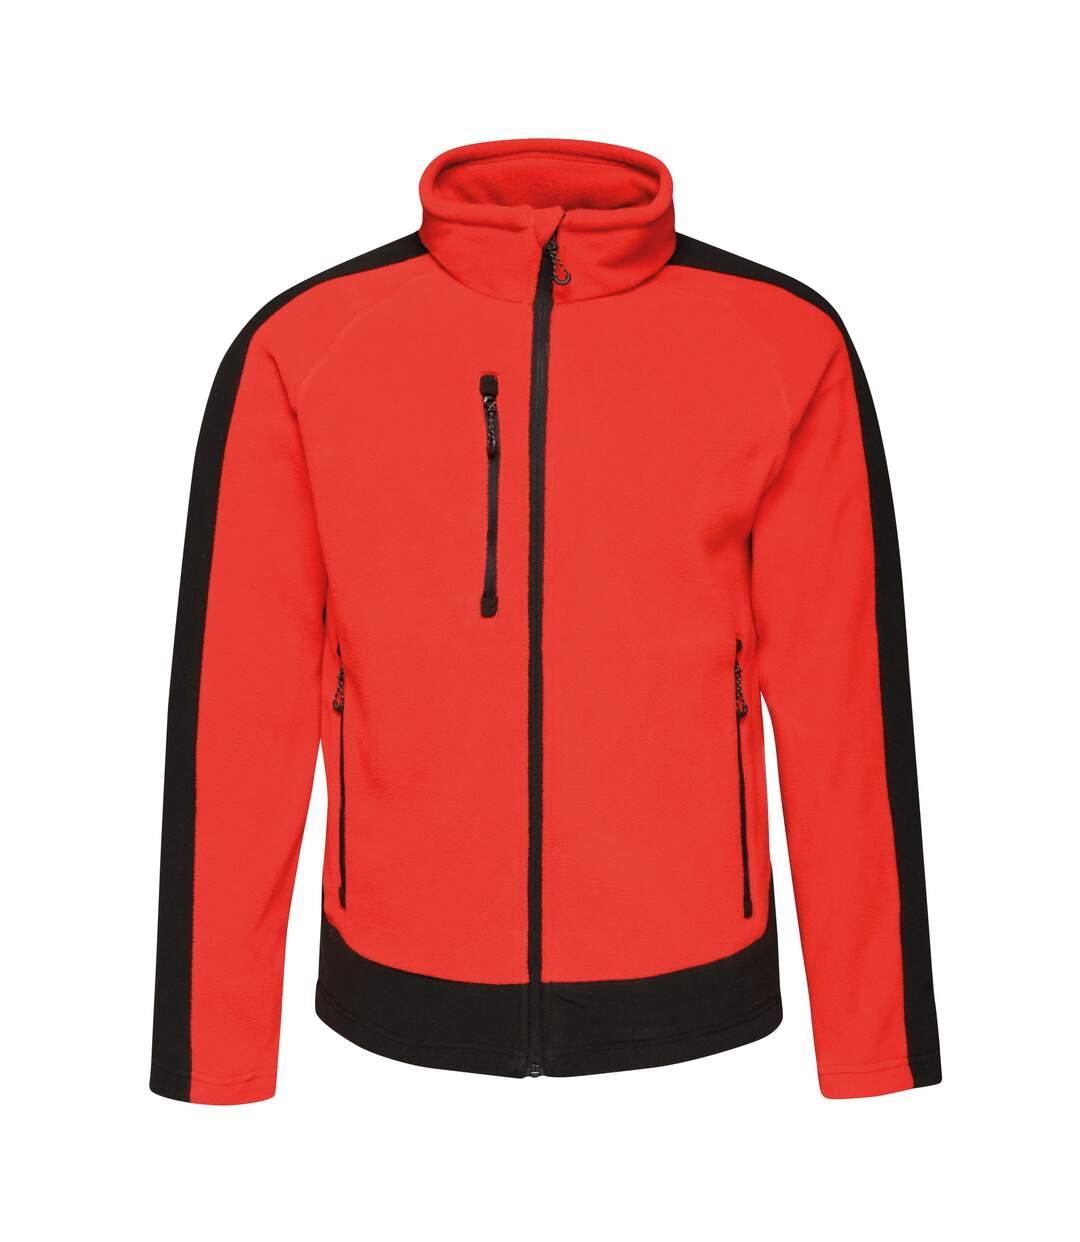 Regatta Contrast Mens 300 Fleece Top/Jacket (Classic Red/Black) - UTRW6352